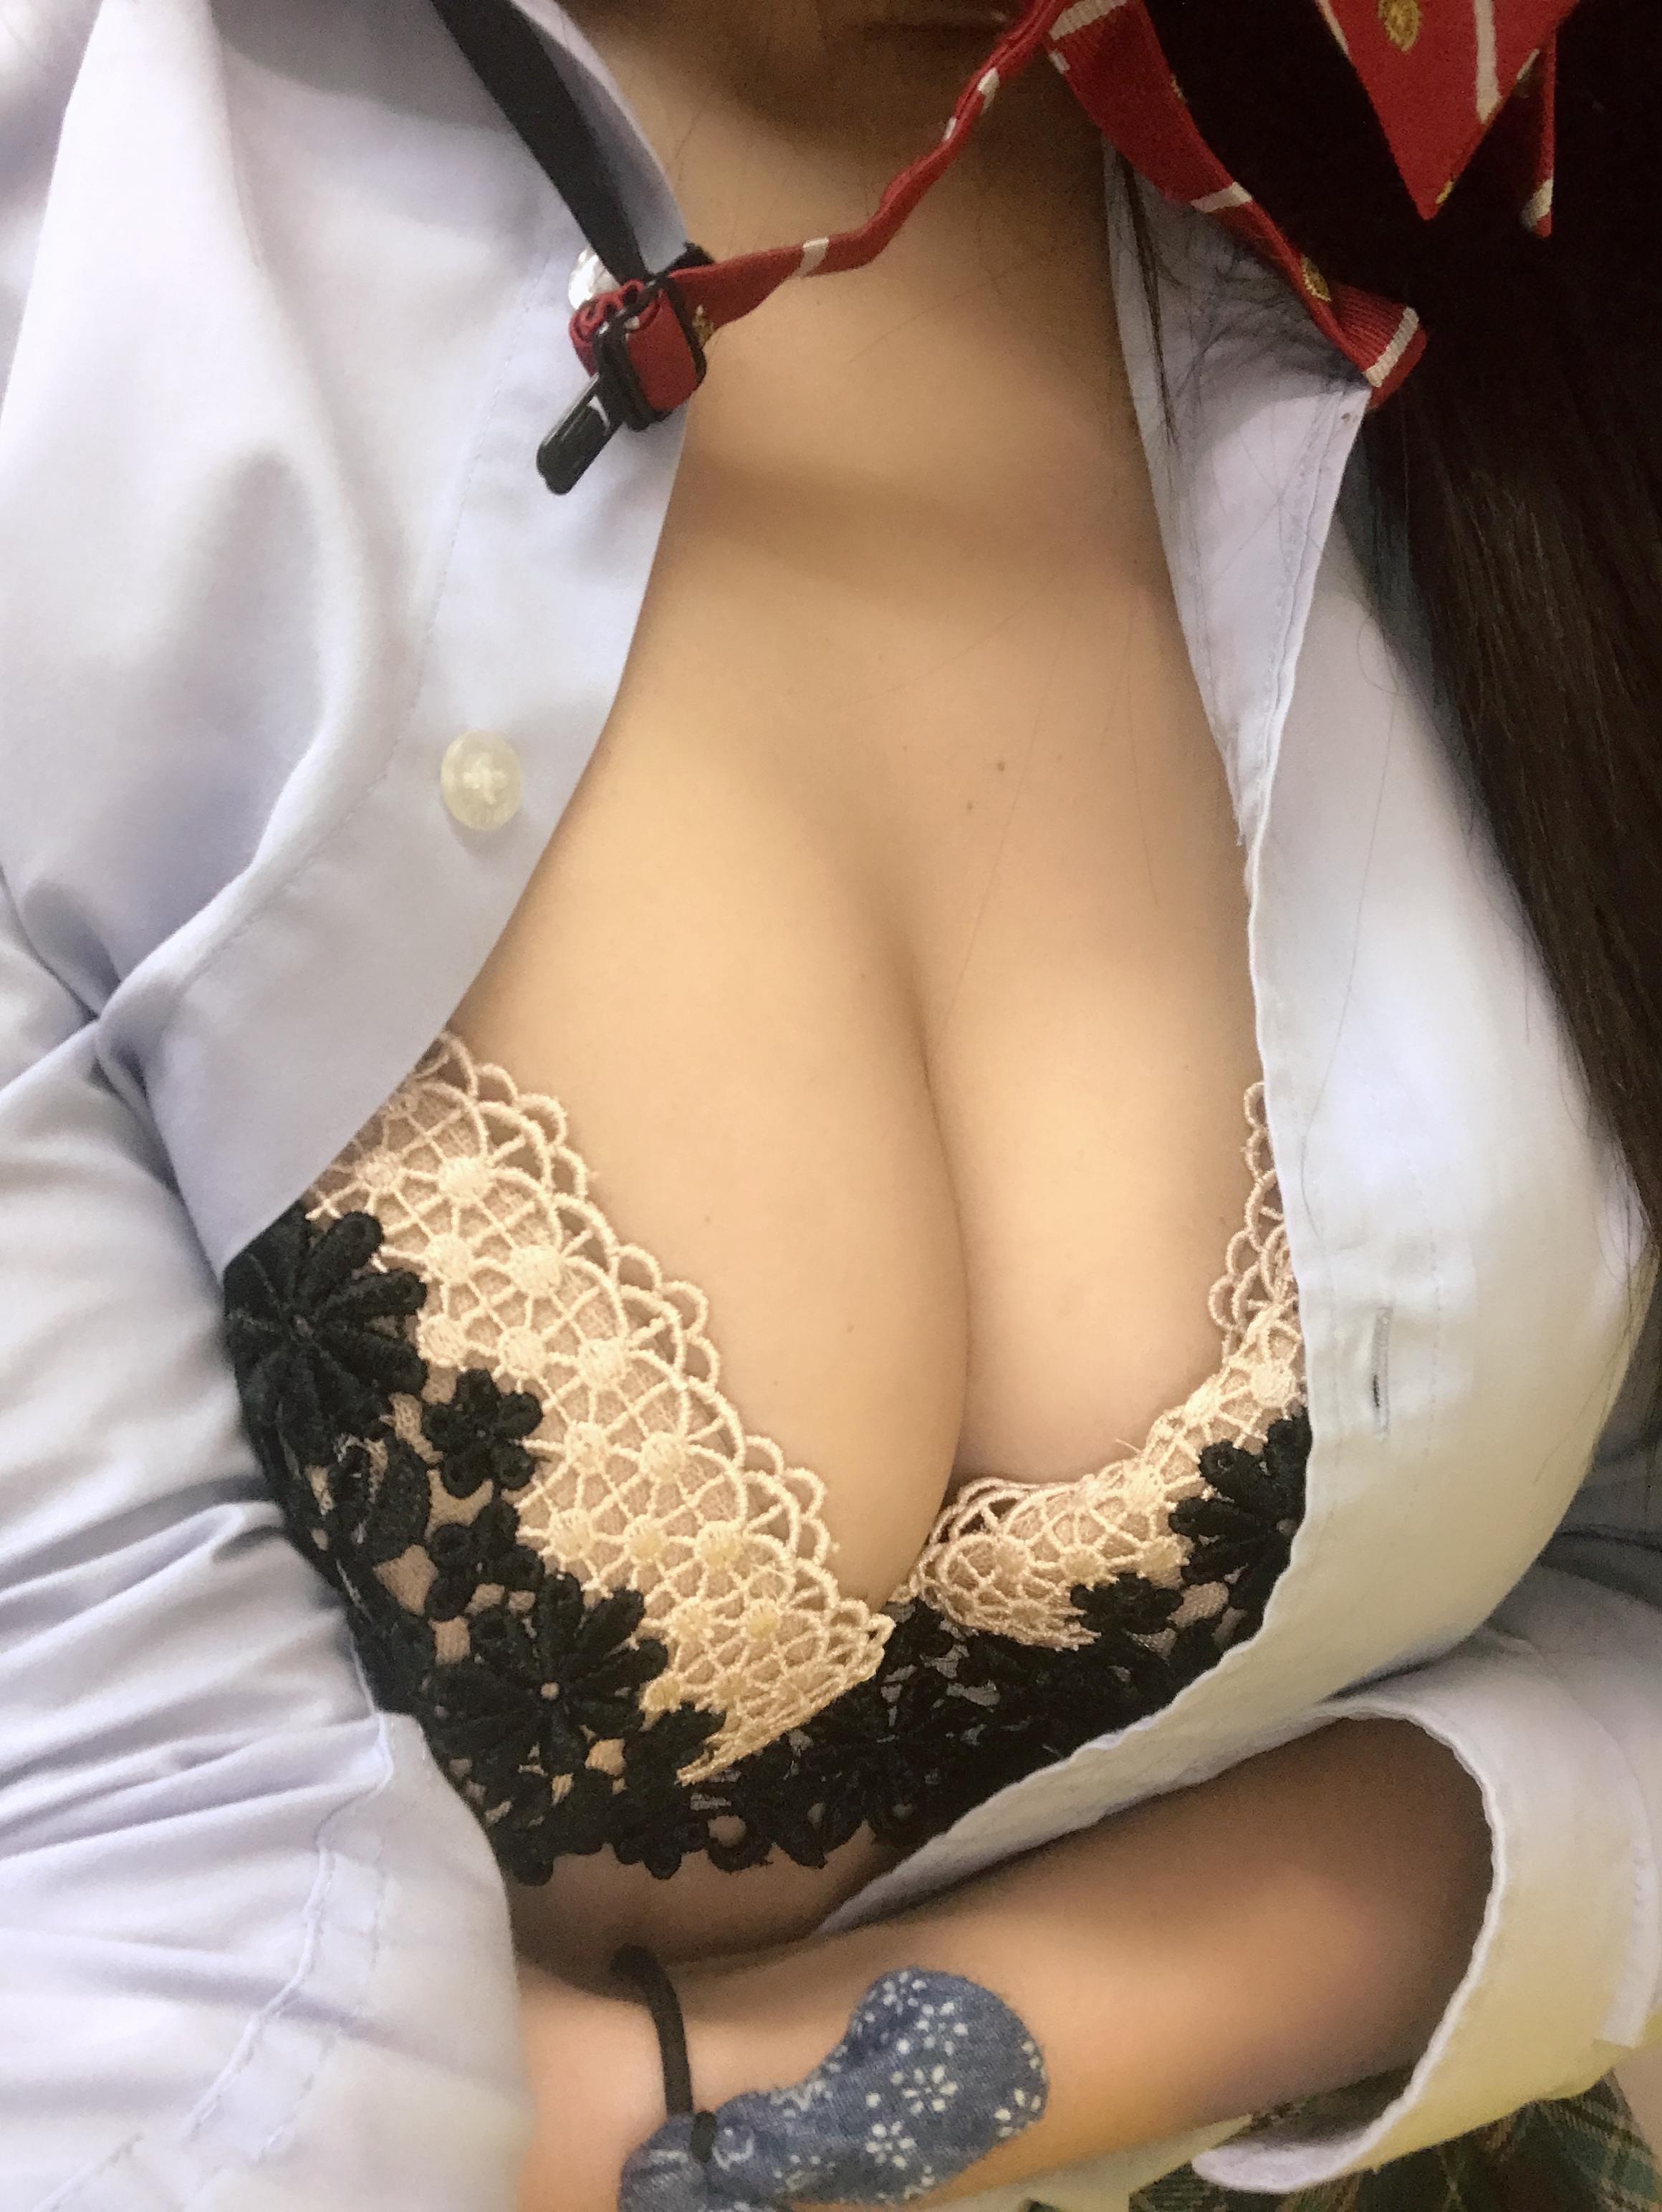 「No78 椎名」10/21(10/21) 16:20 | 椎名の写メ・風俗動画